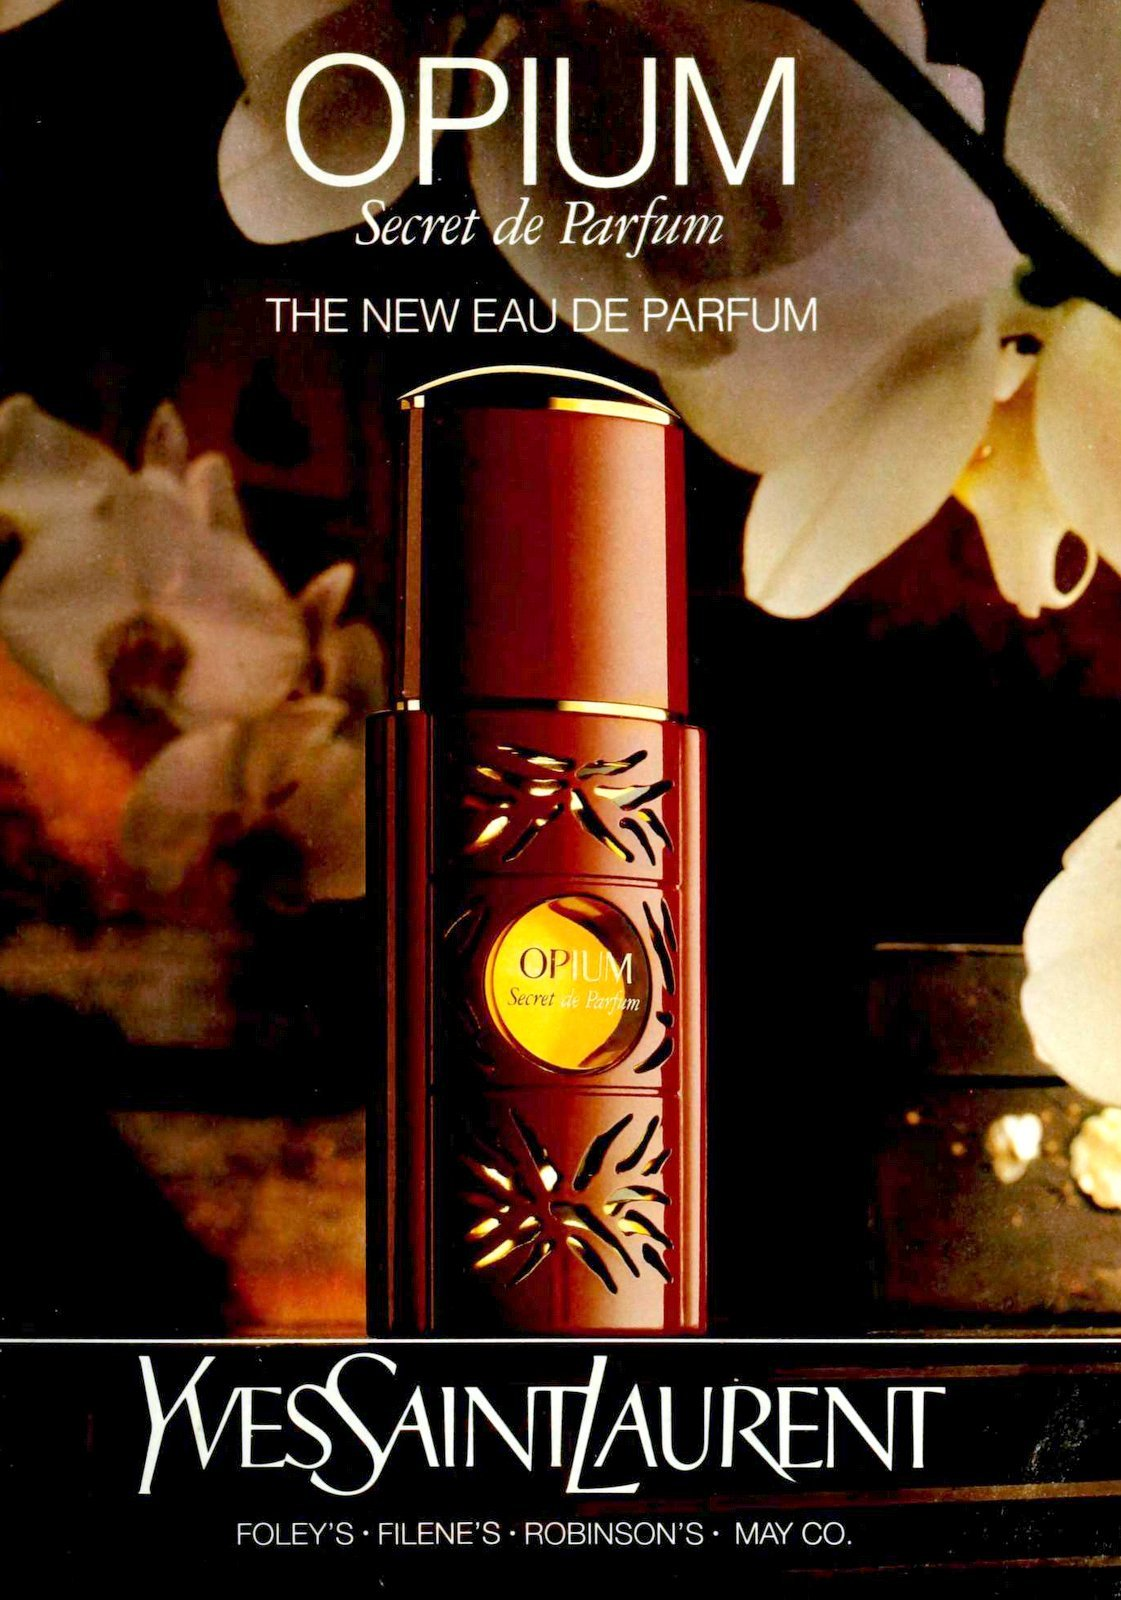 Opium eau de parfum from Yves Saint Laurent (1993) at ClickAmericana.com